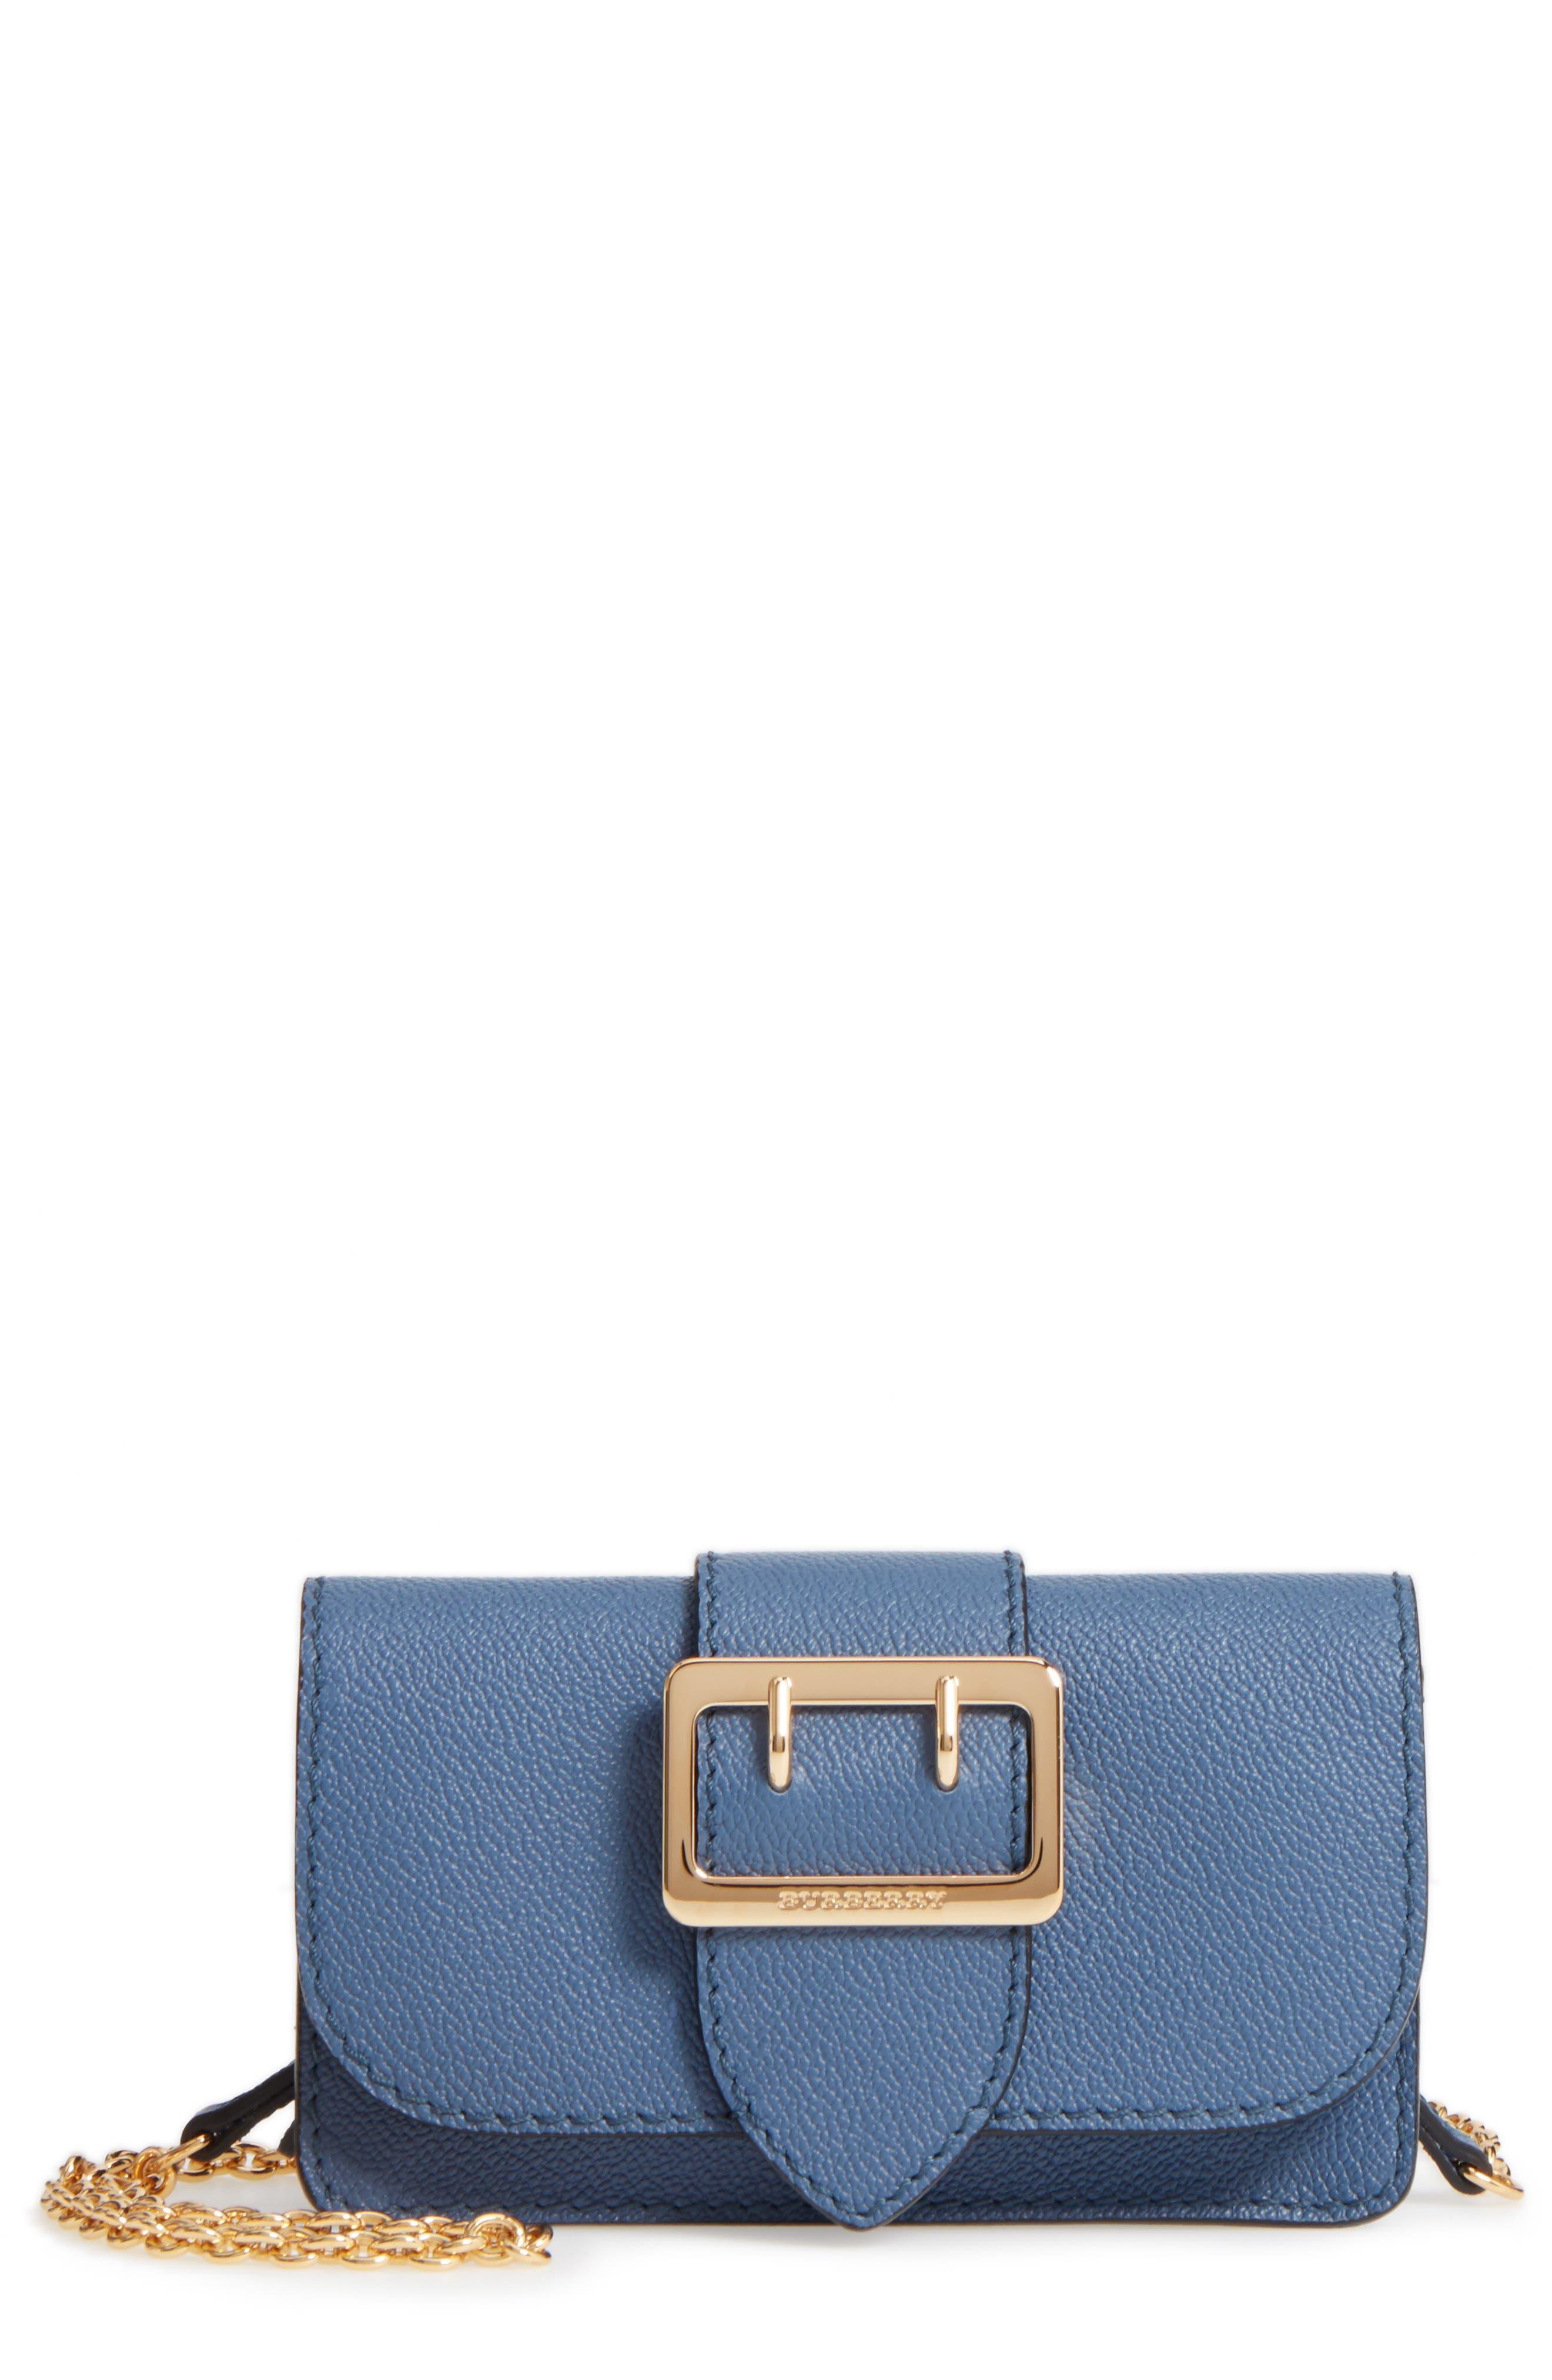 Burberry Mini Buckle Leather Bag